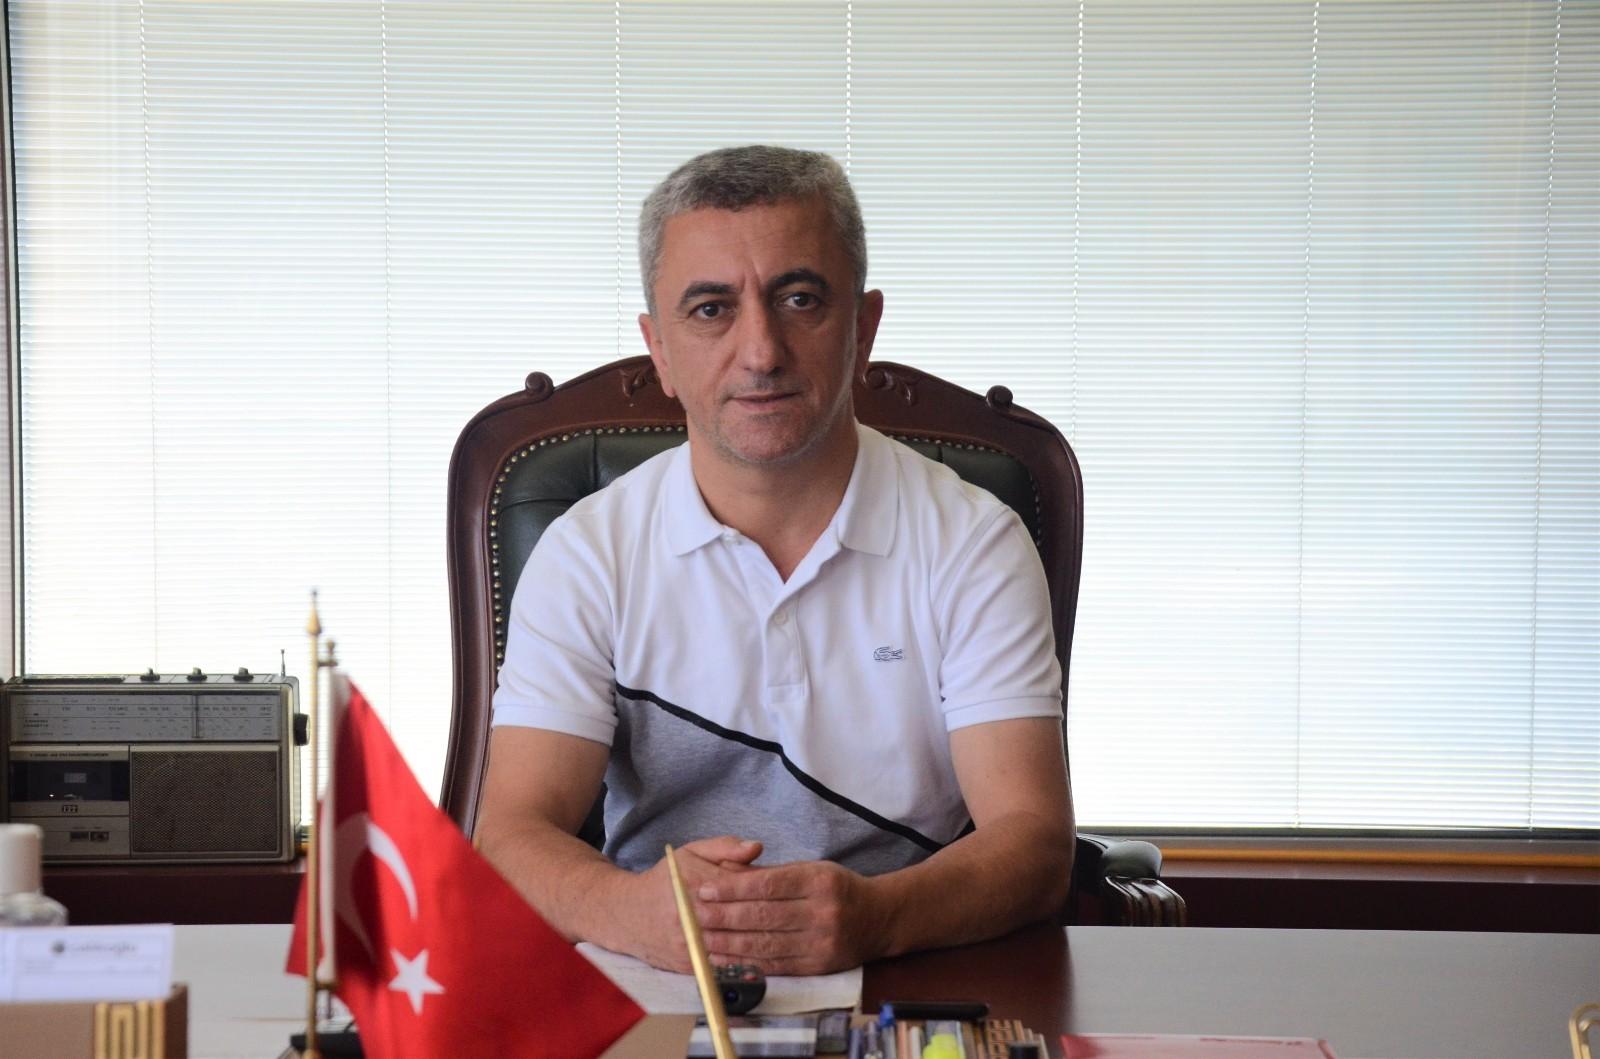 (Turkish) ORDU'LU FİRMA AVRUPA'YA AÇILIYOR.